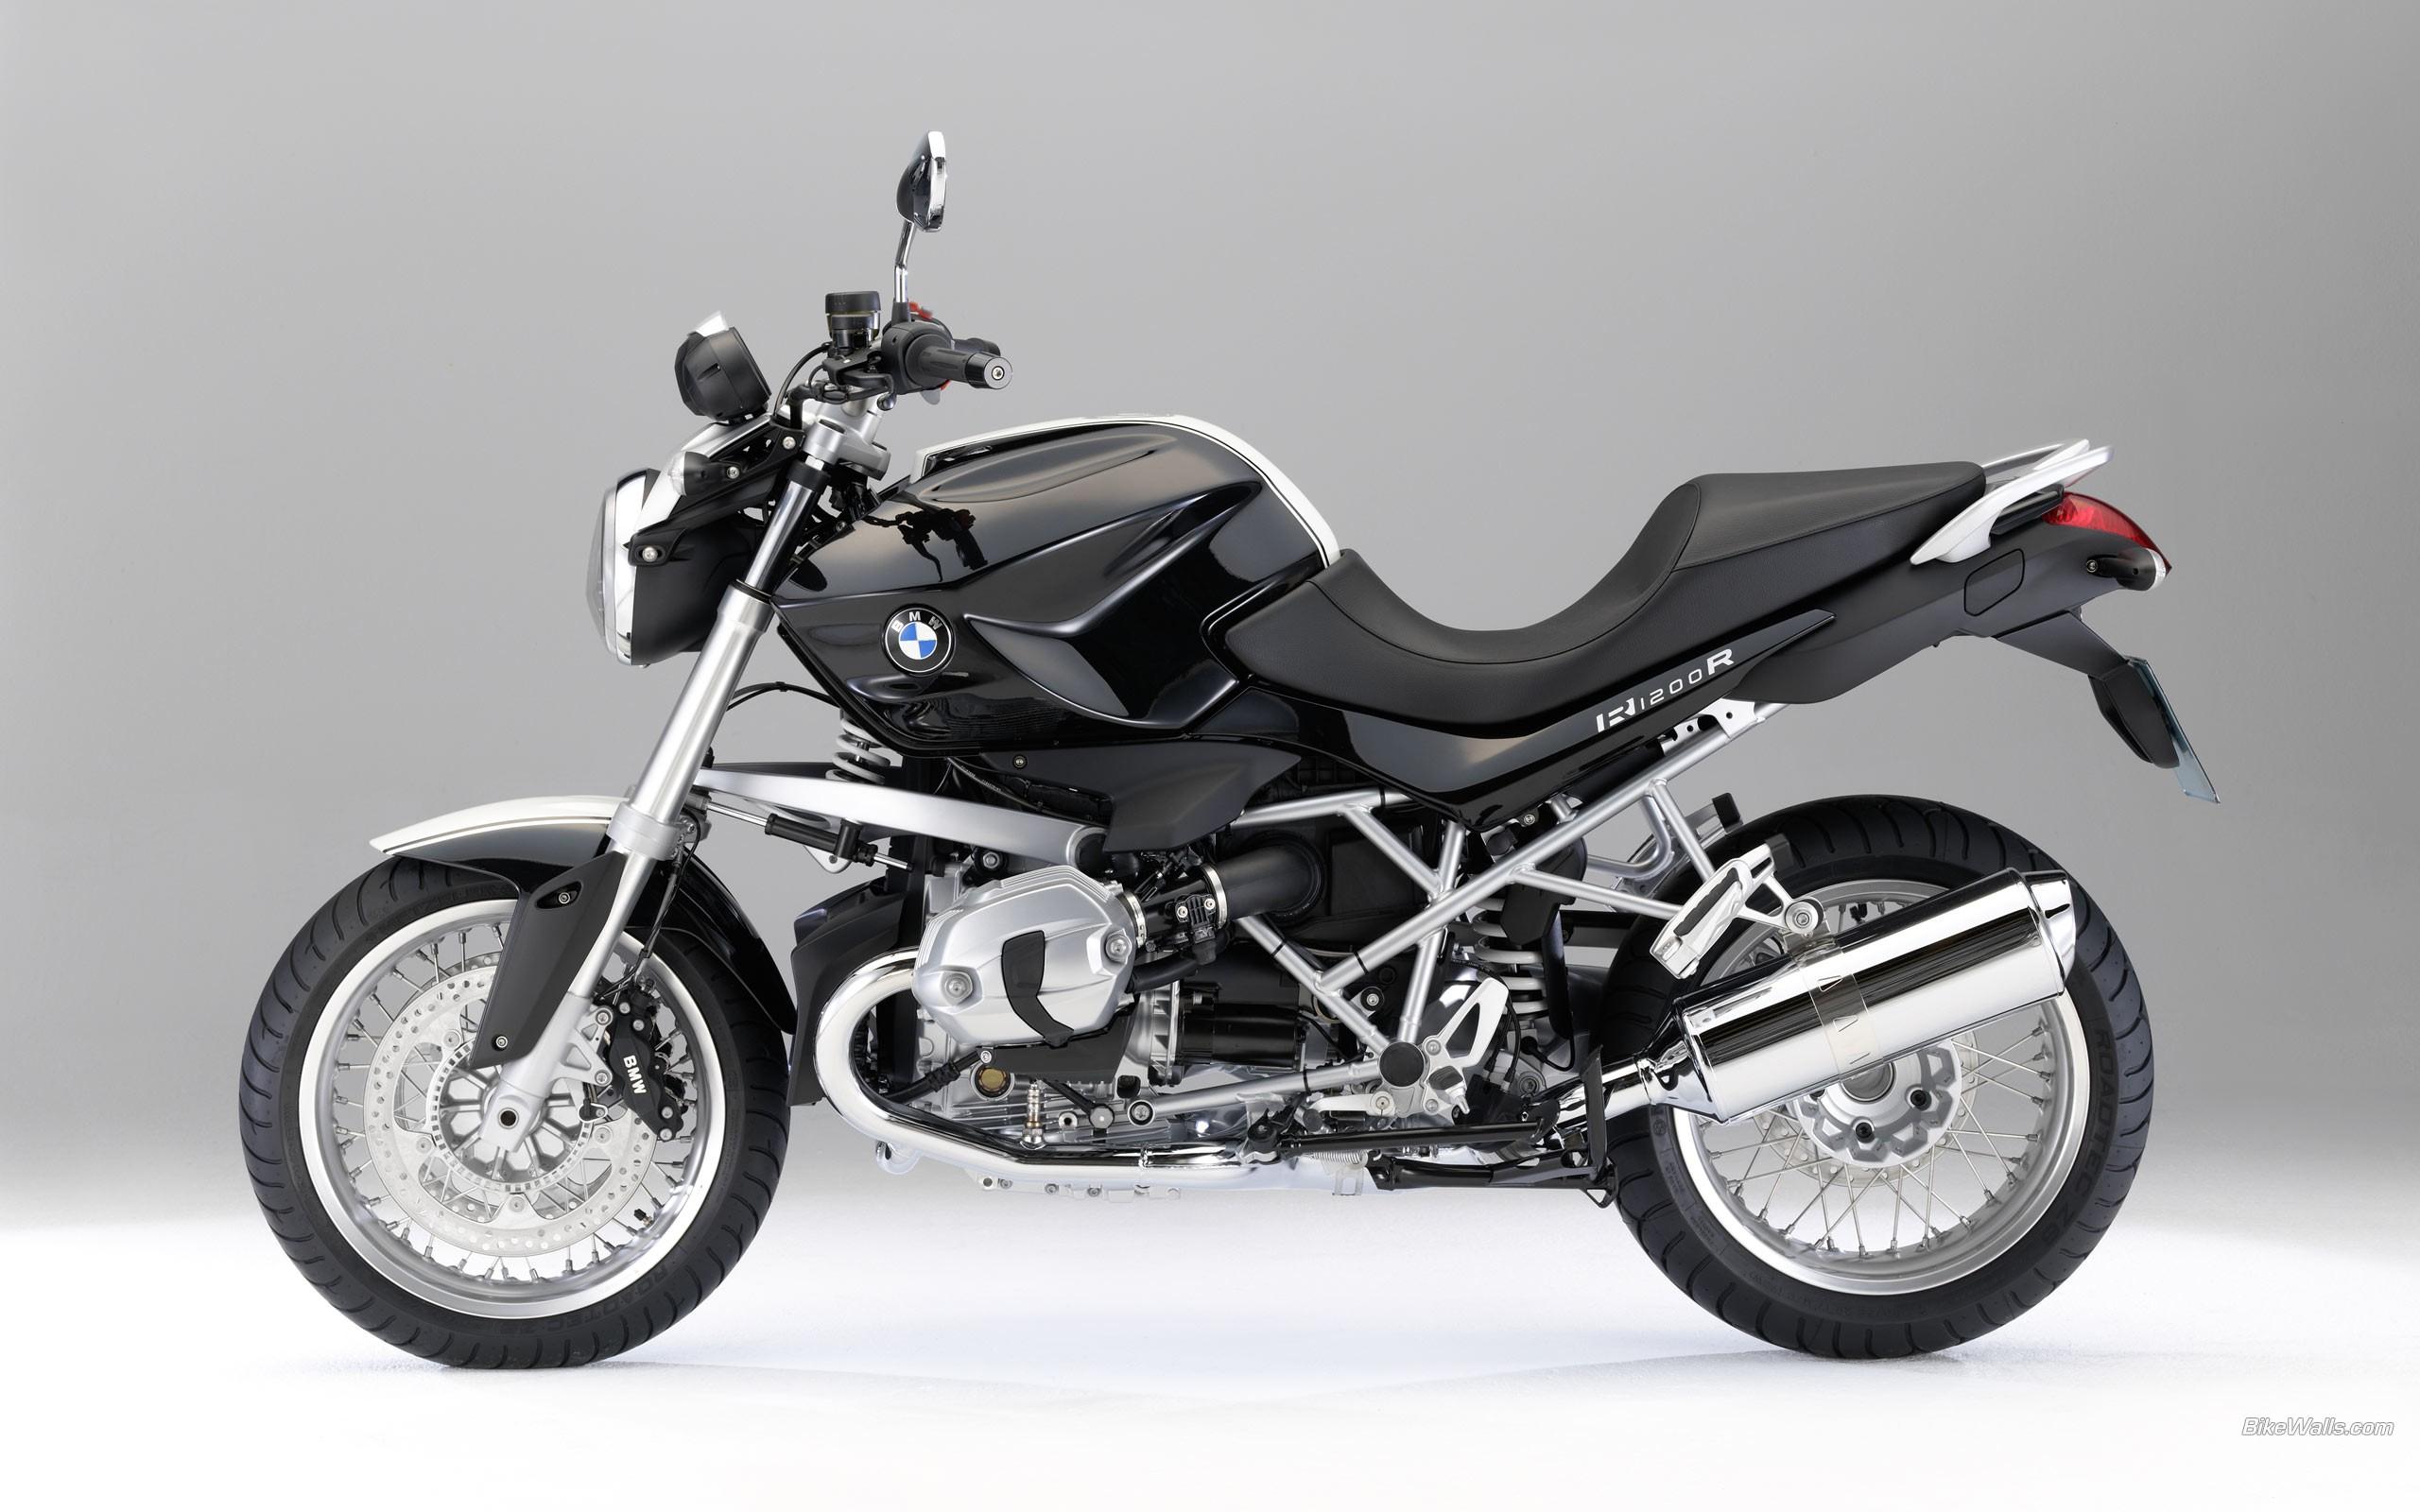 Motos BMW 1200R - 2560x1600